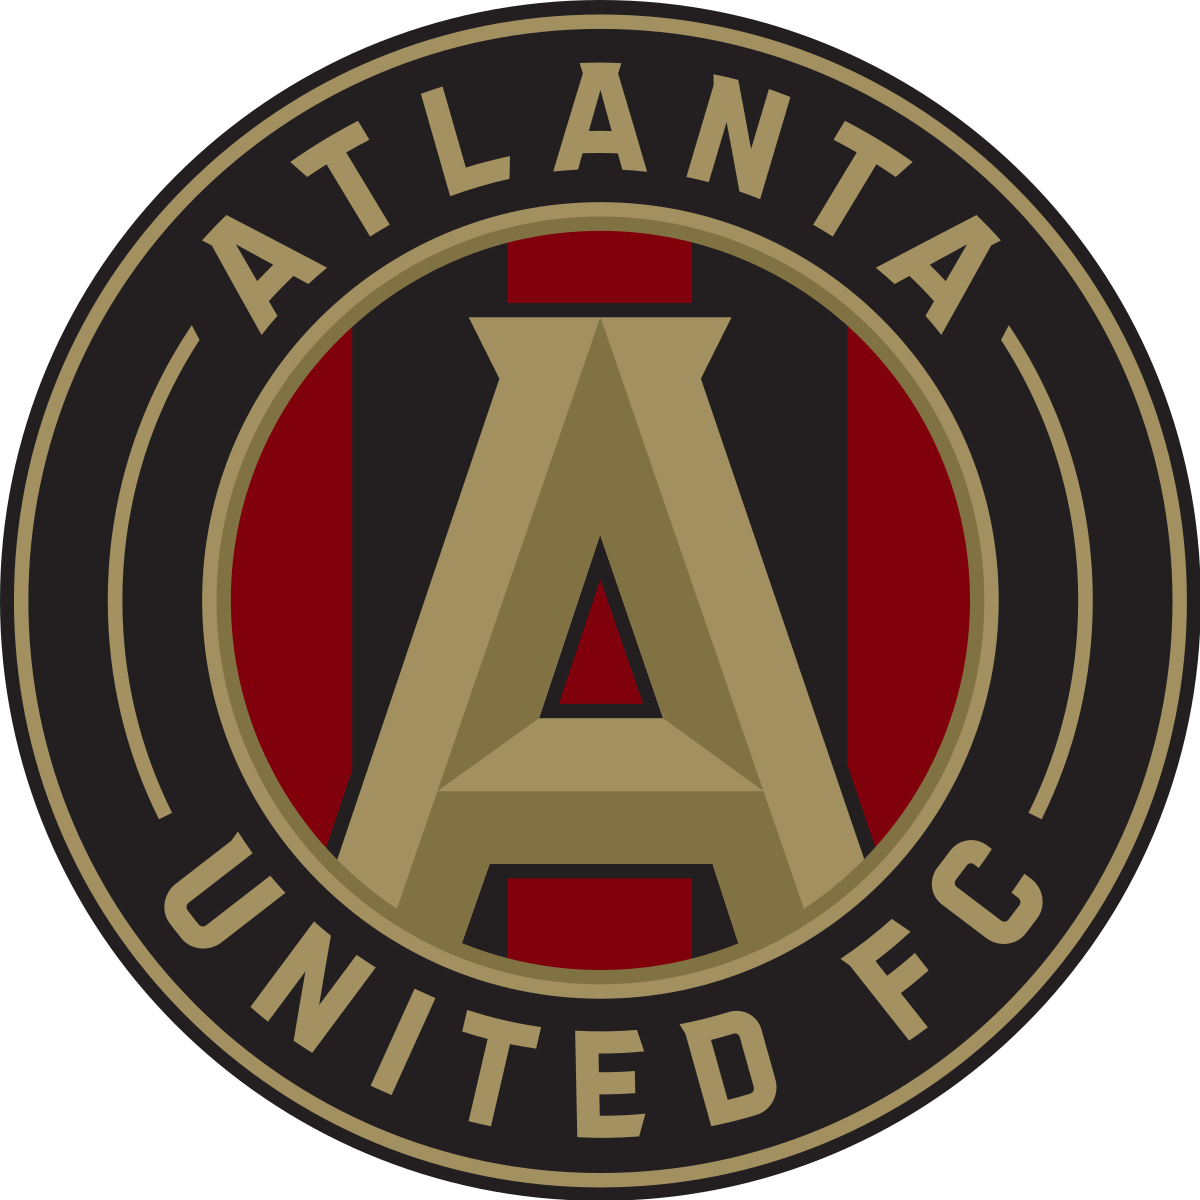 540b3236 Atlanta United FC - Wikipedia